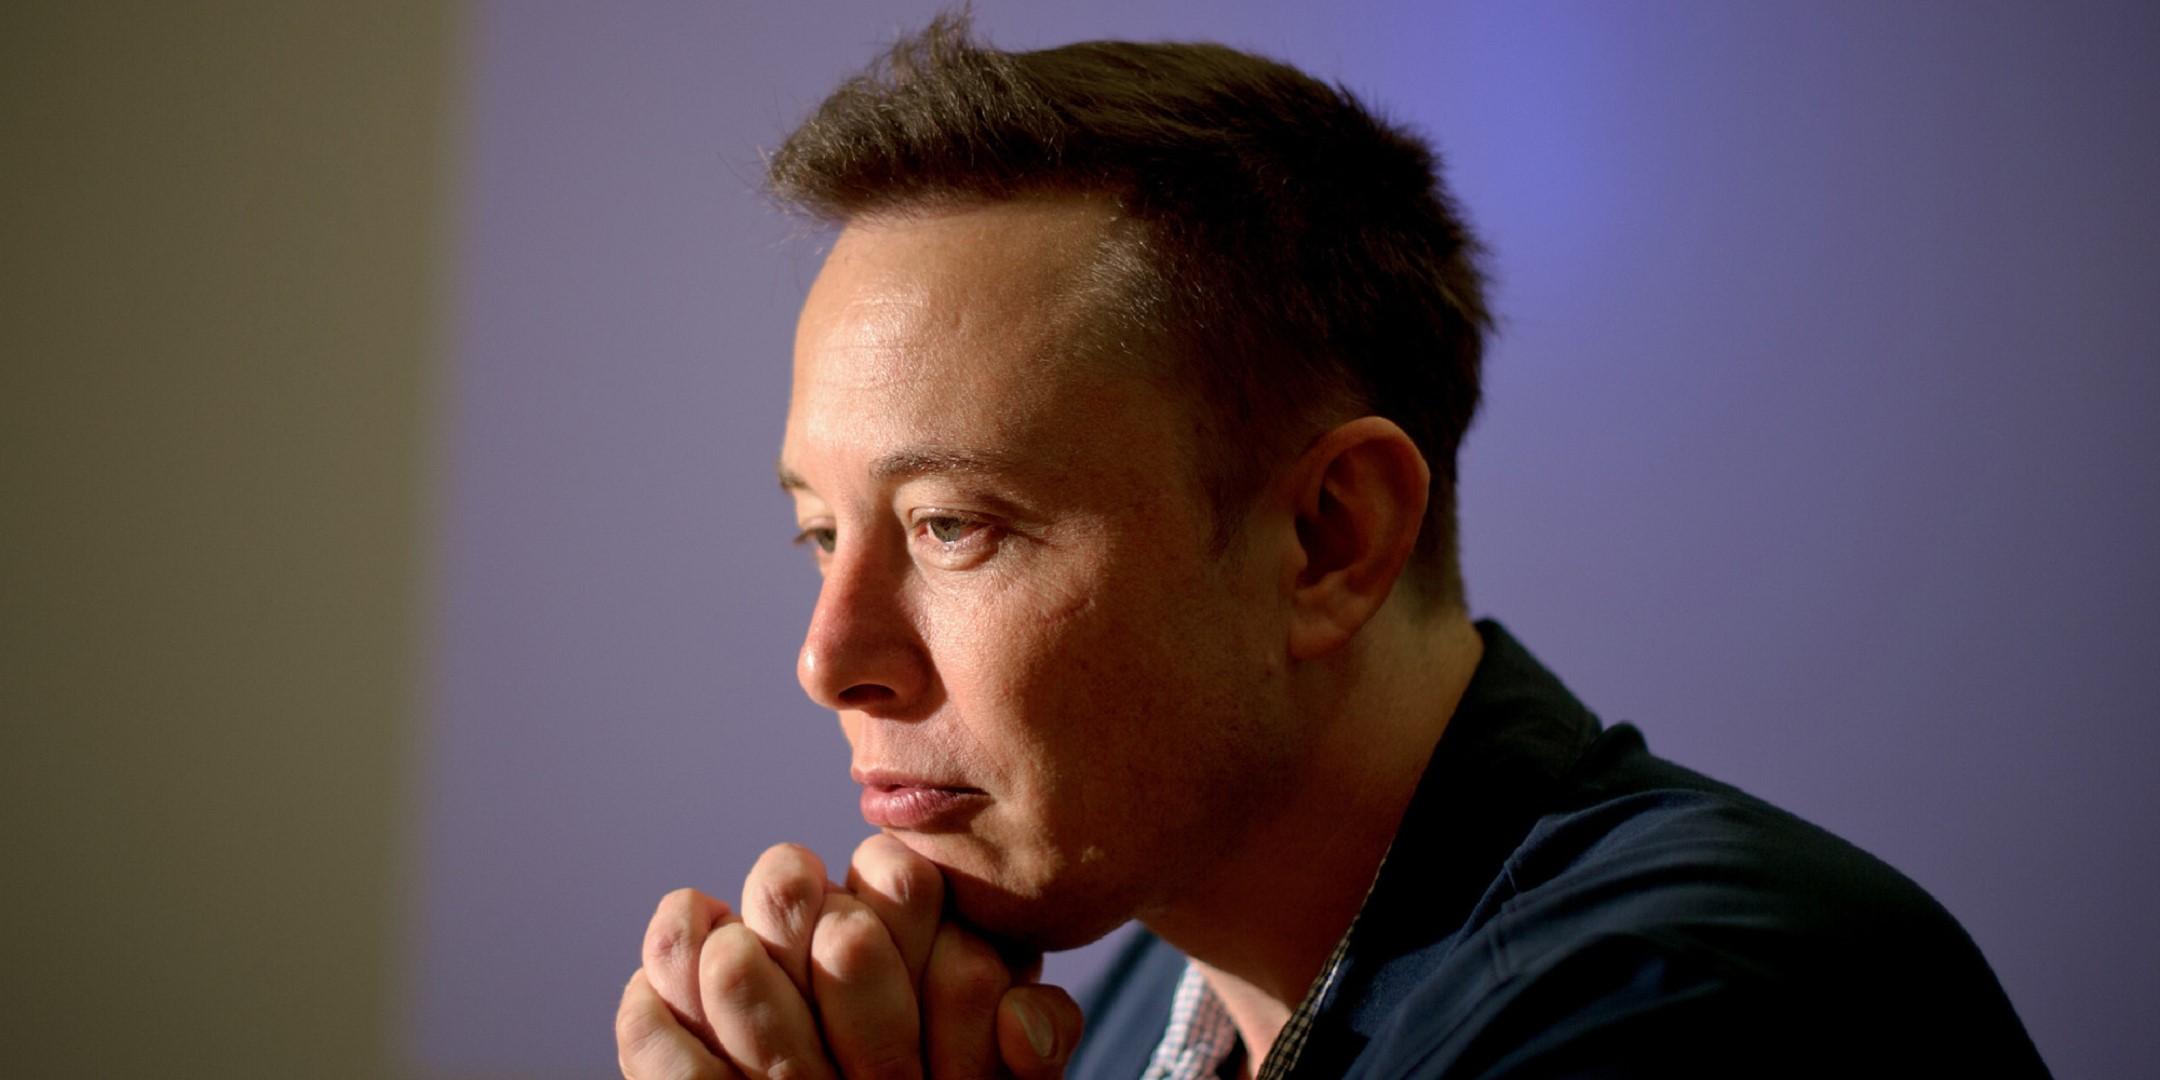 Elon Musk Background images